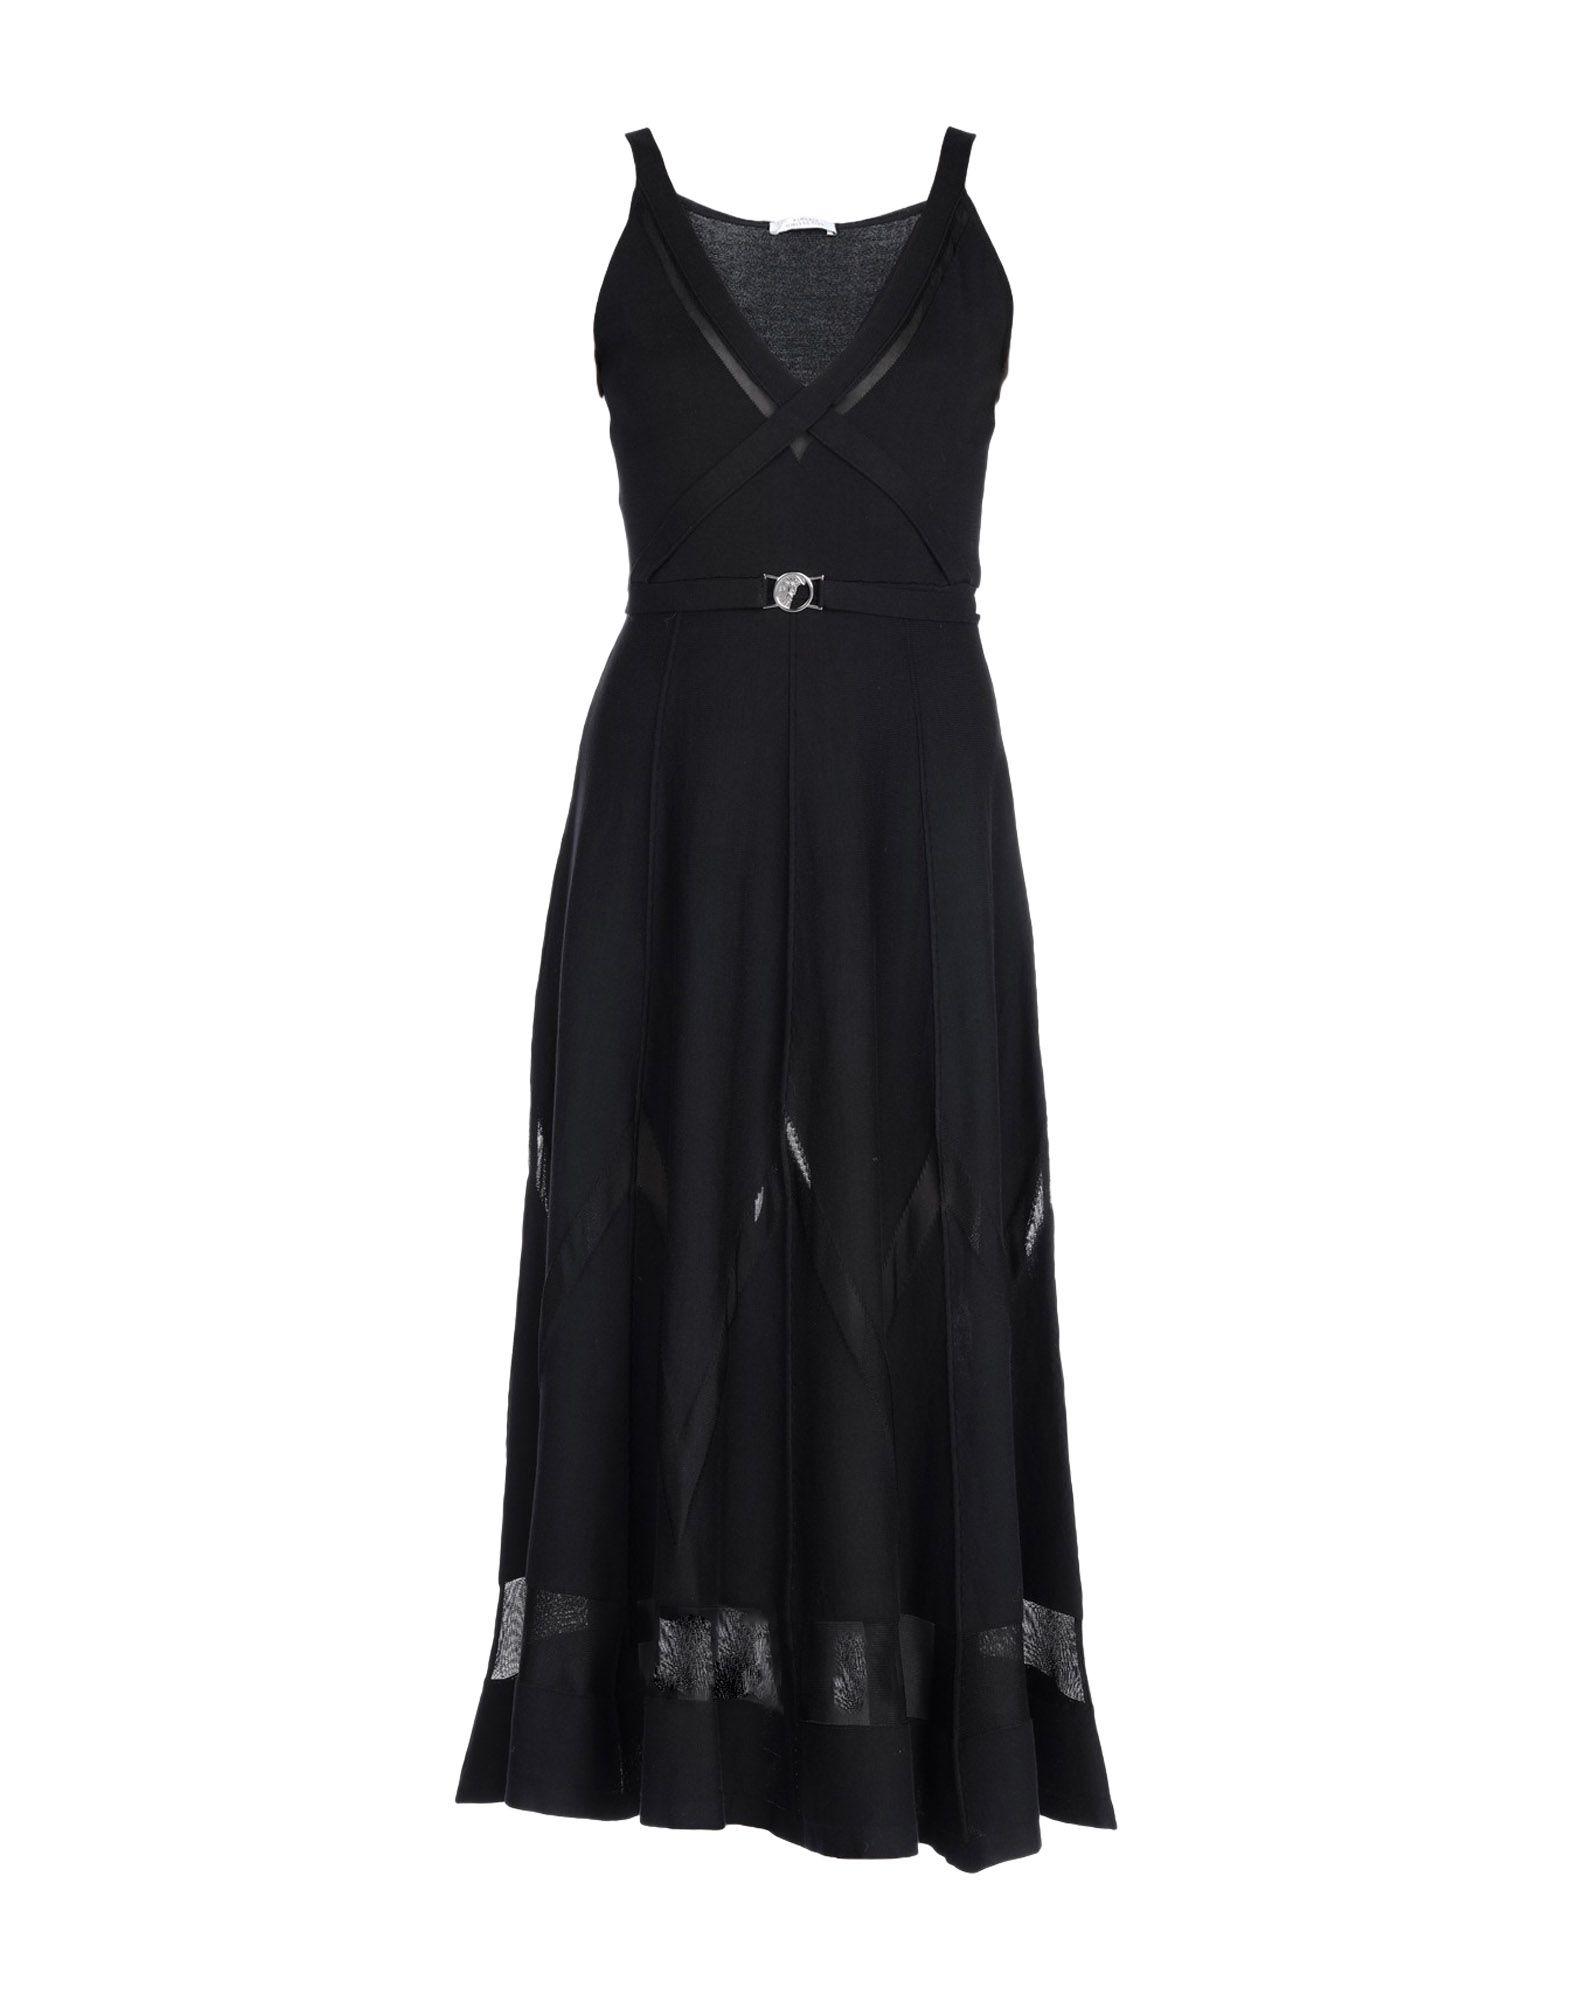 Фото - VERSACE COLLECTION Платье длиной 3/4 versus versace платье длиной 3 4